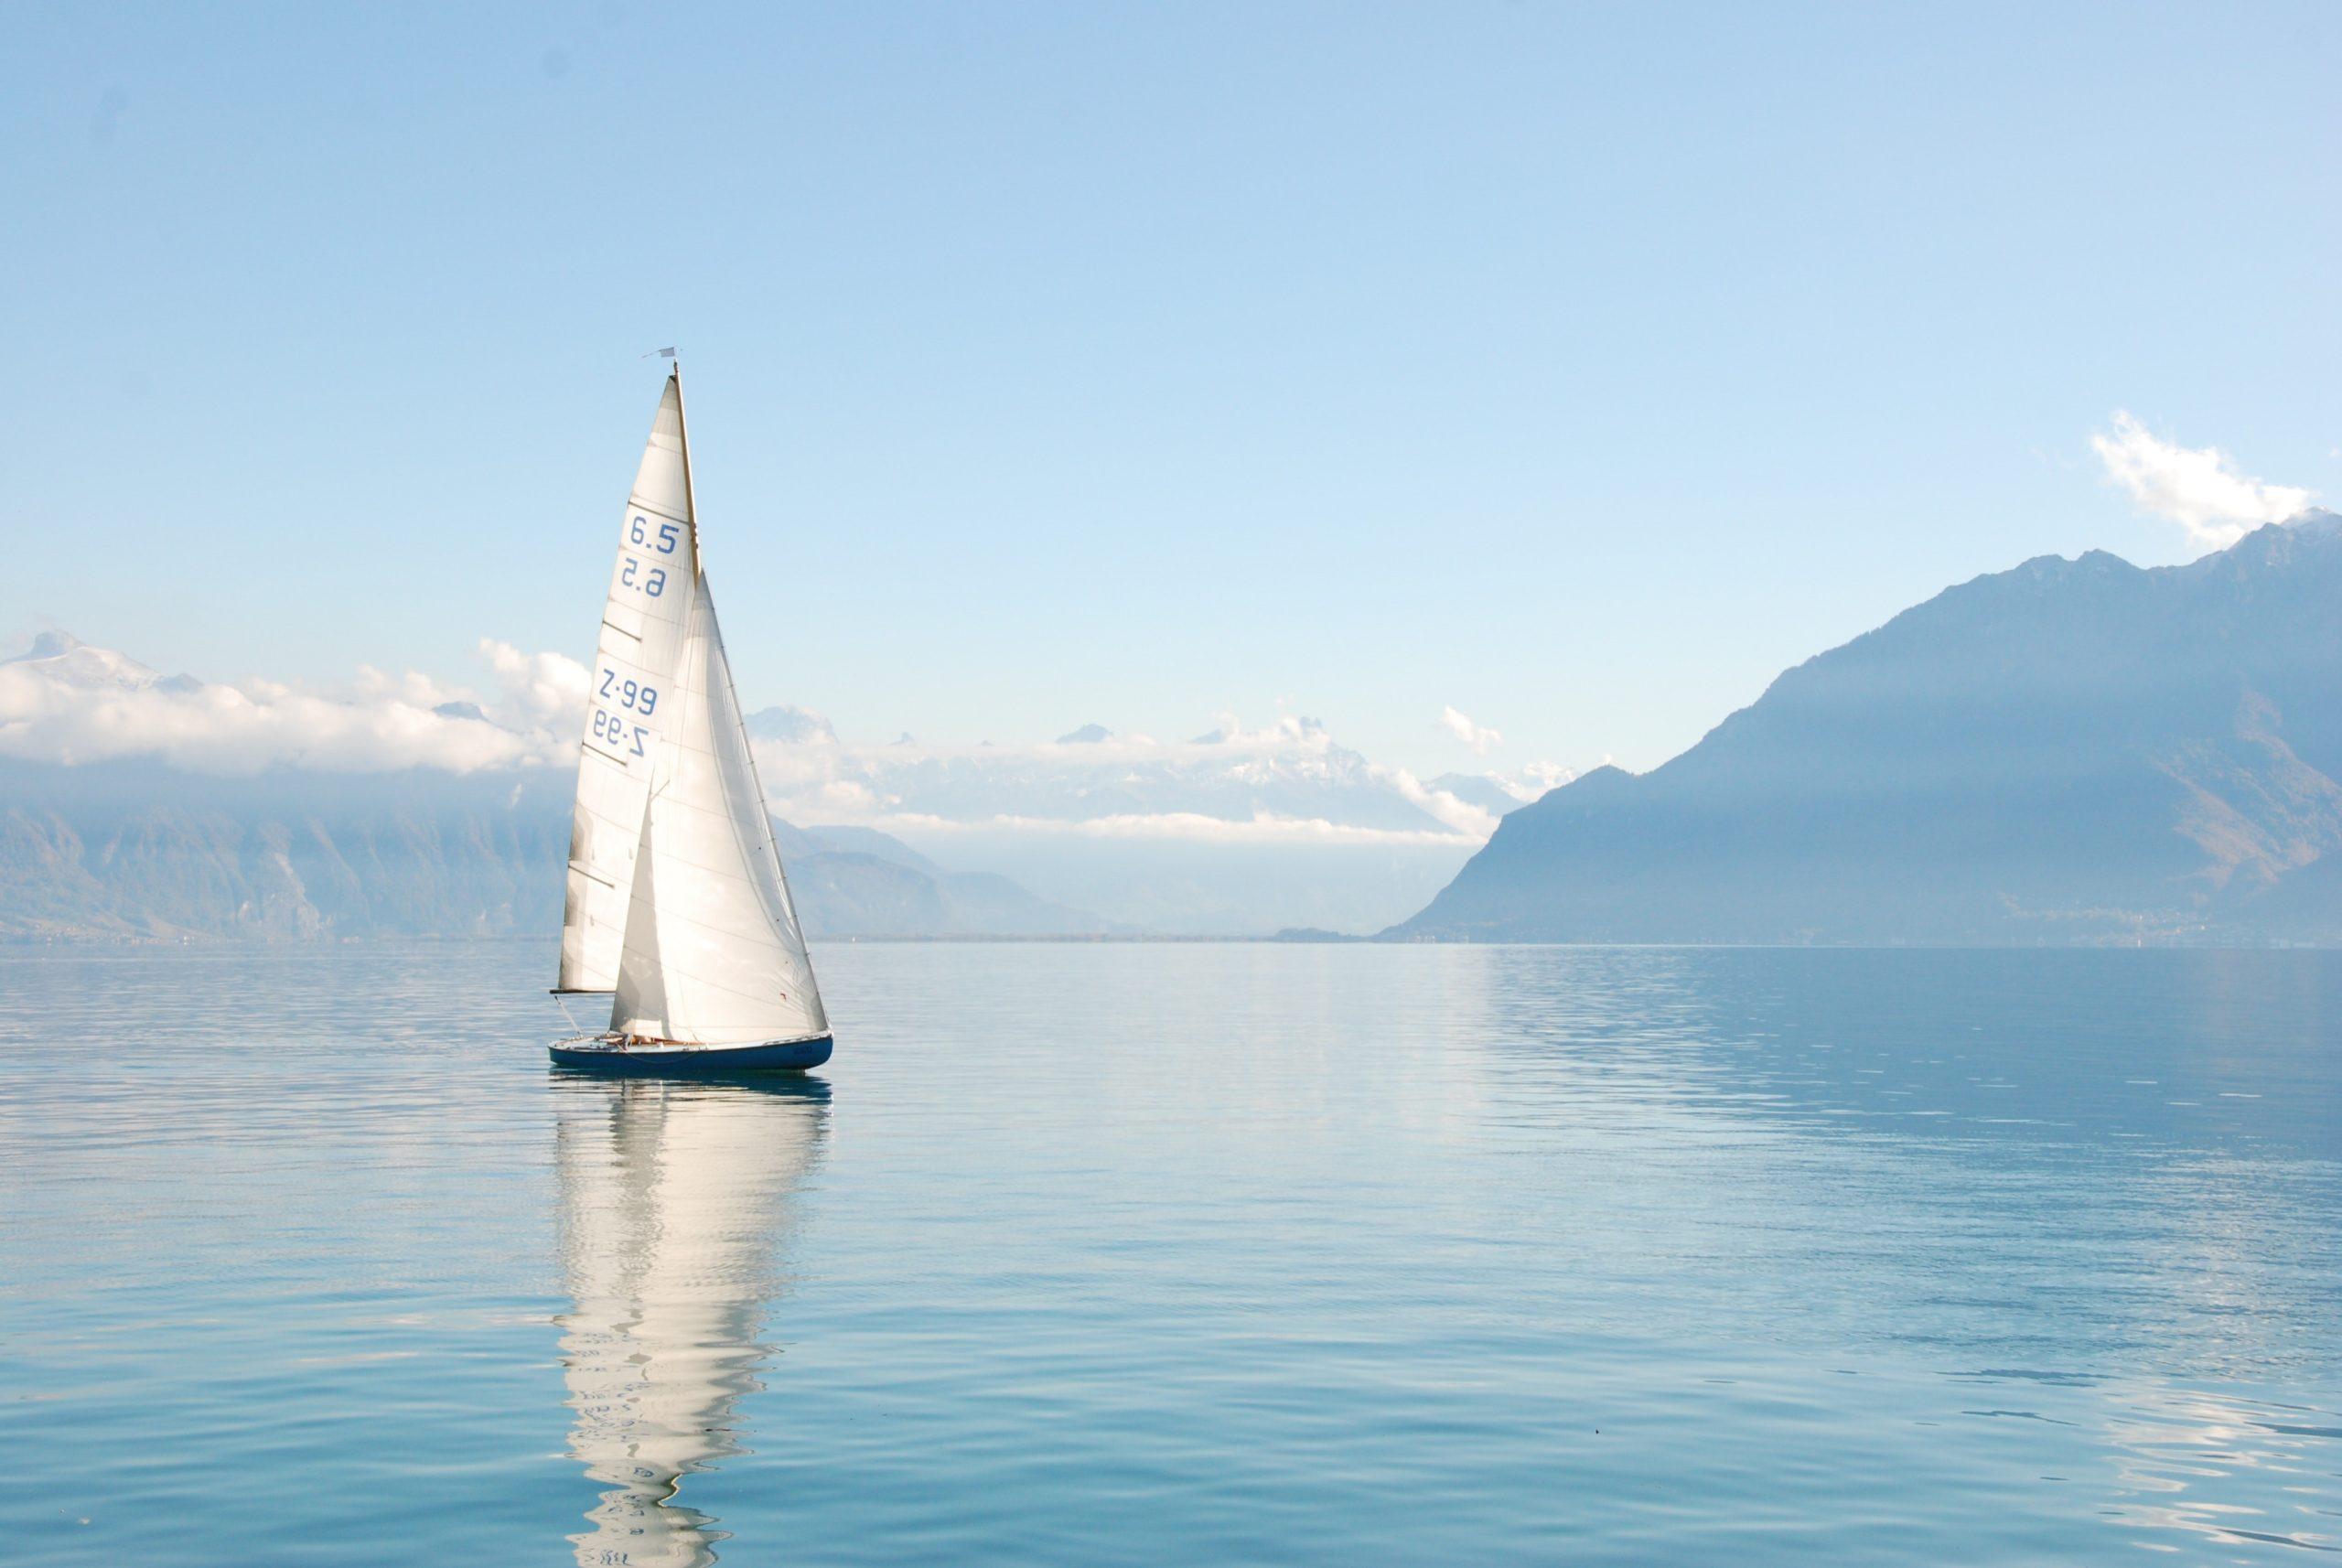 Macassa Bay Yacht Club